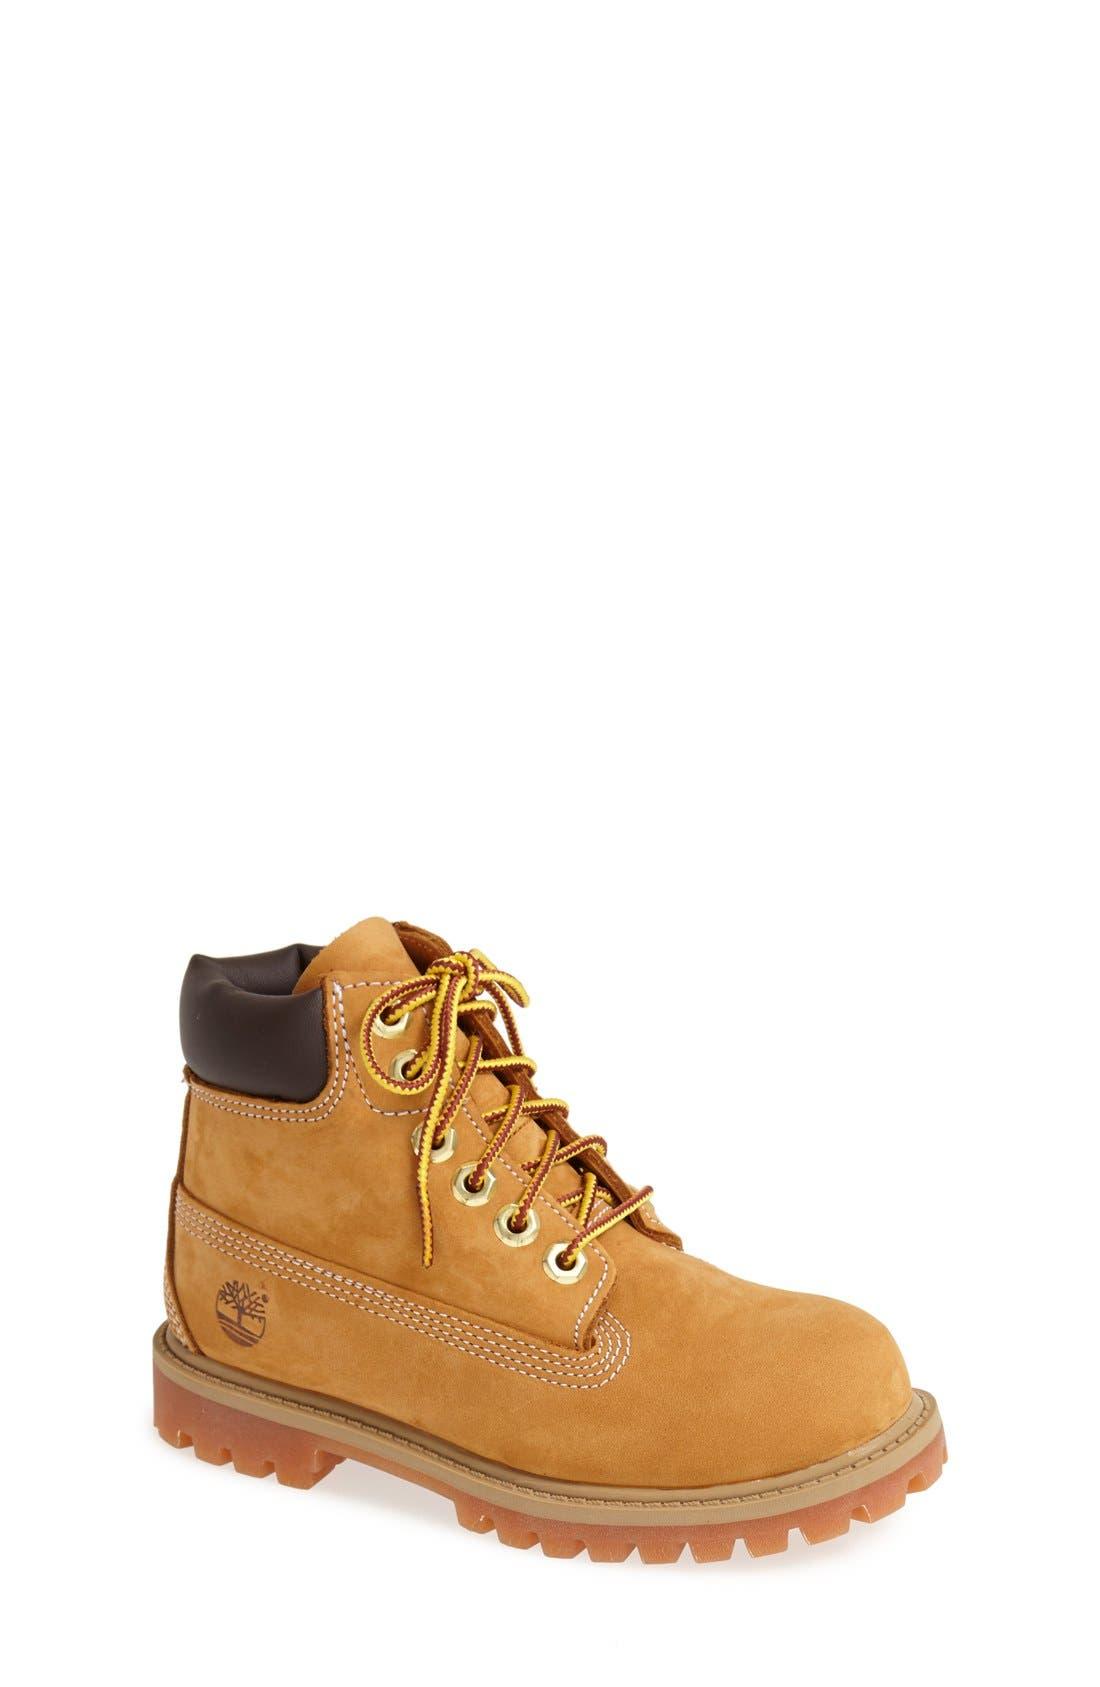 Main Image - Timberland '6 Premium' Waterproof Leather Boot (Walker & Toddler)